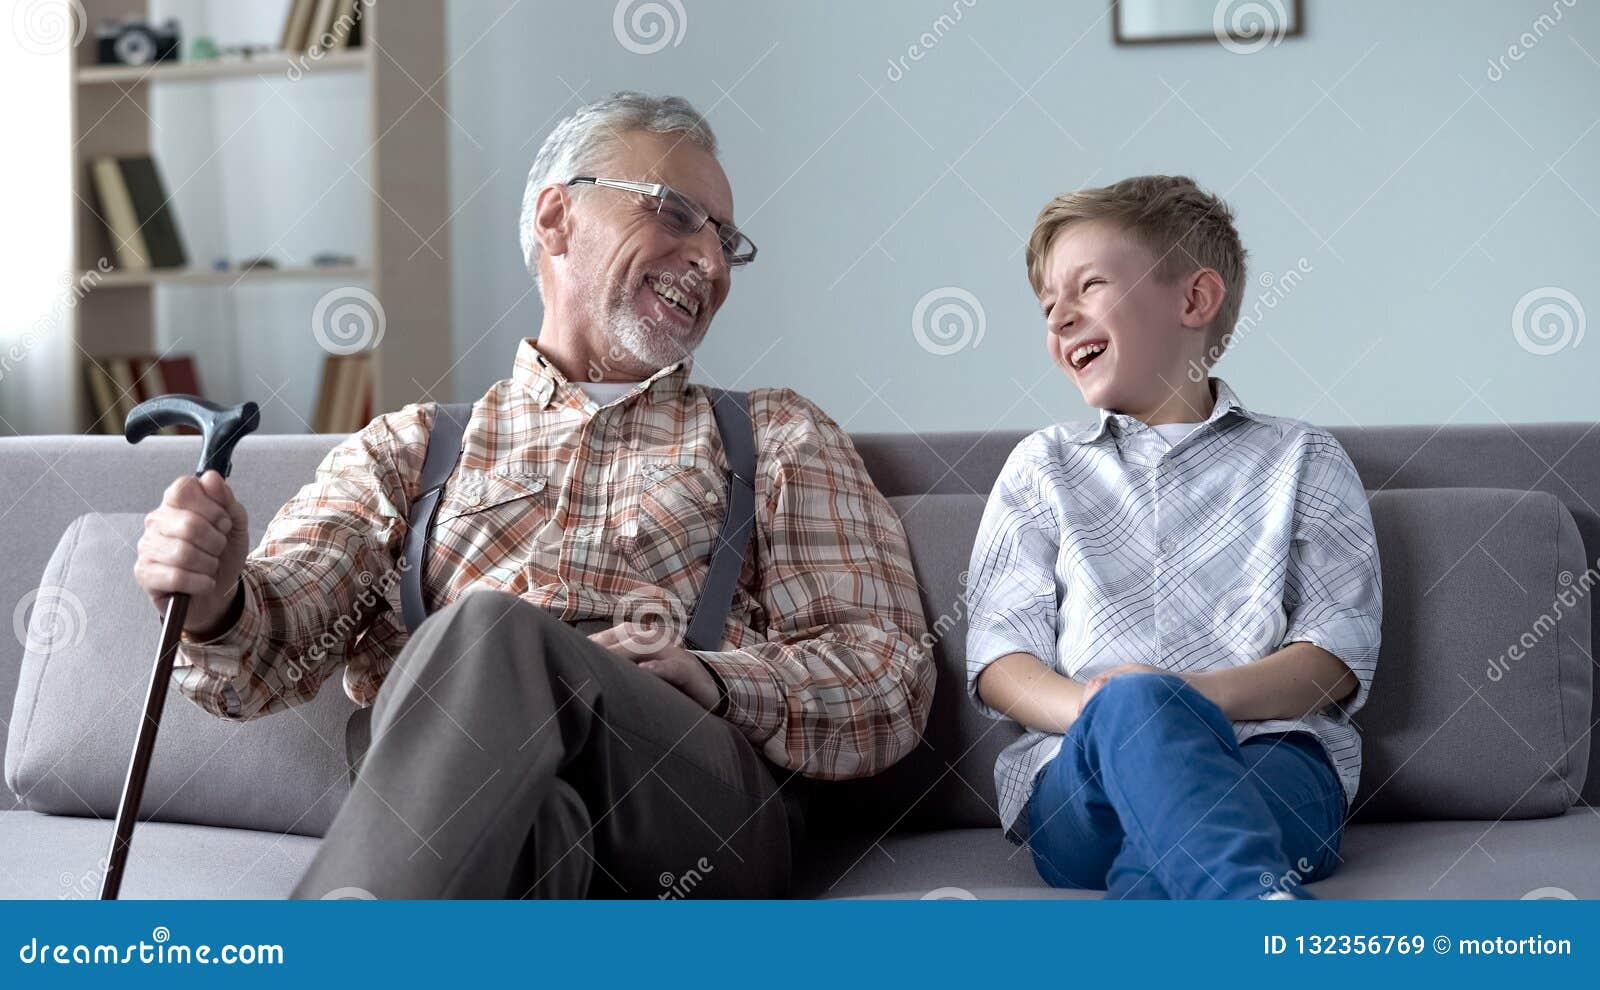 Grandpa και εγγονός που γελούν πραγματικά, αστειεμένος, πολύτιμες στιγμές διασκέδασης από κοινού